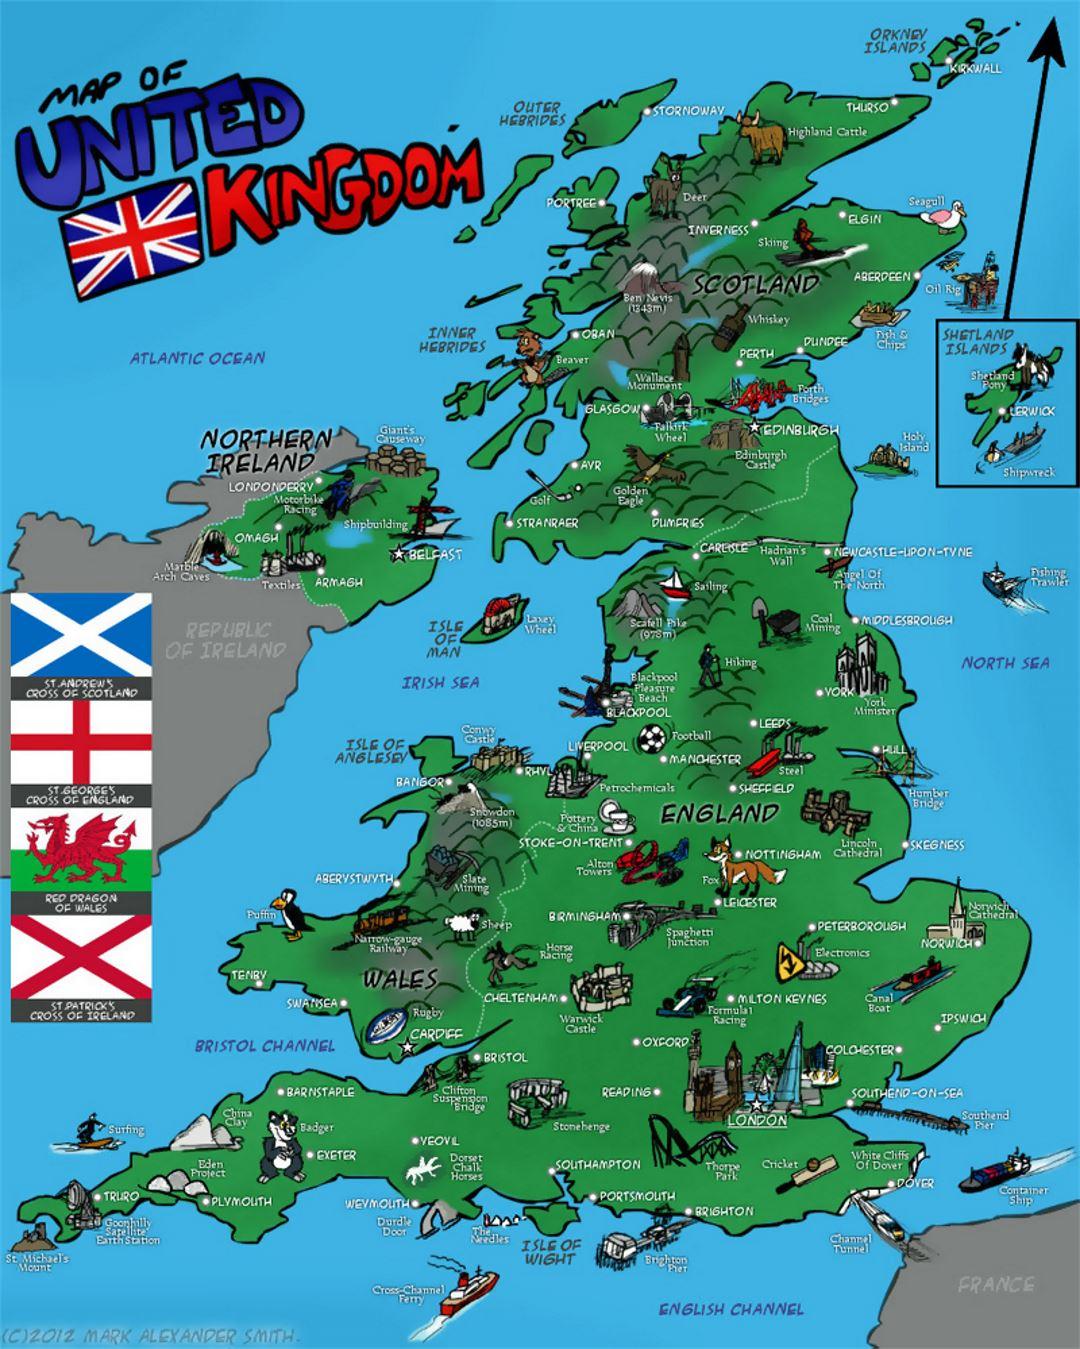 Tourist illustrated map of United Kingdom | United Kingdom ... on illustrated wedding map, illustrated beach map, illustrated island map,